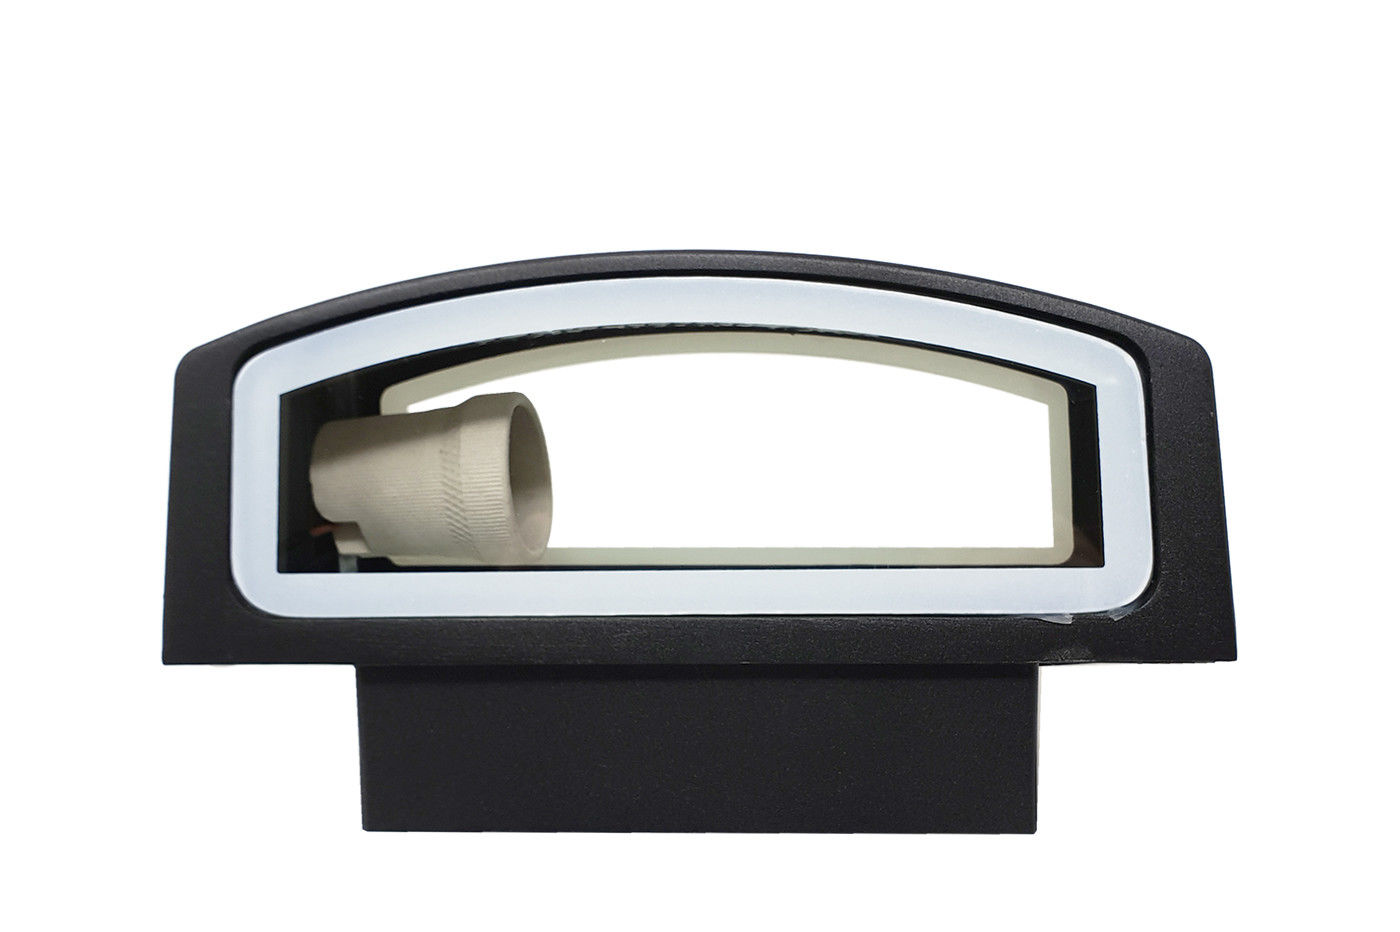 Dsi 01545 lampade a led damastoreitalia applique esterno 2 vie